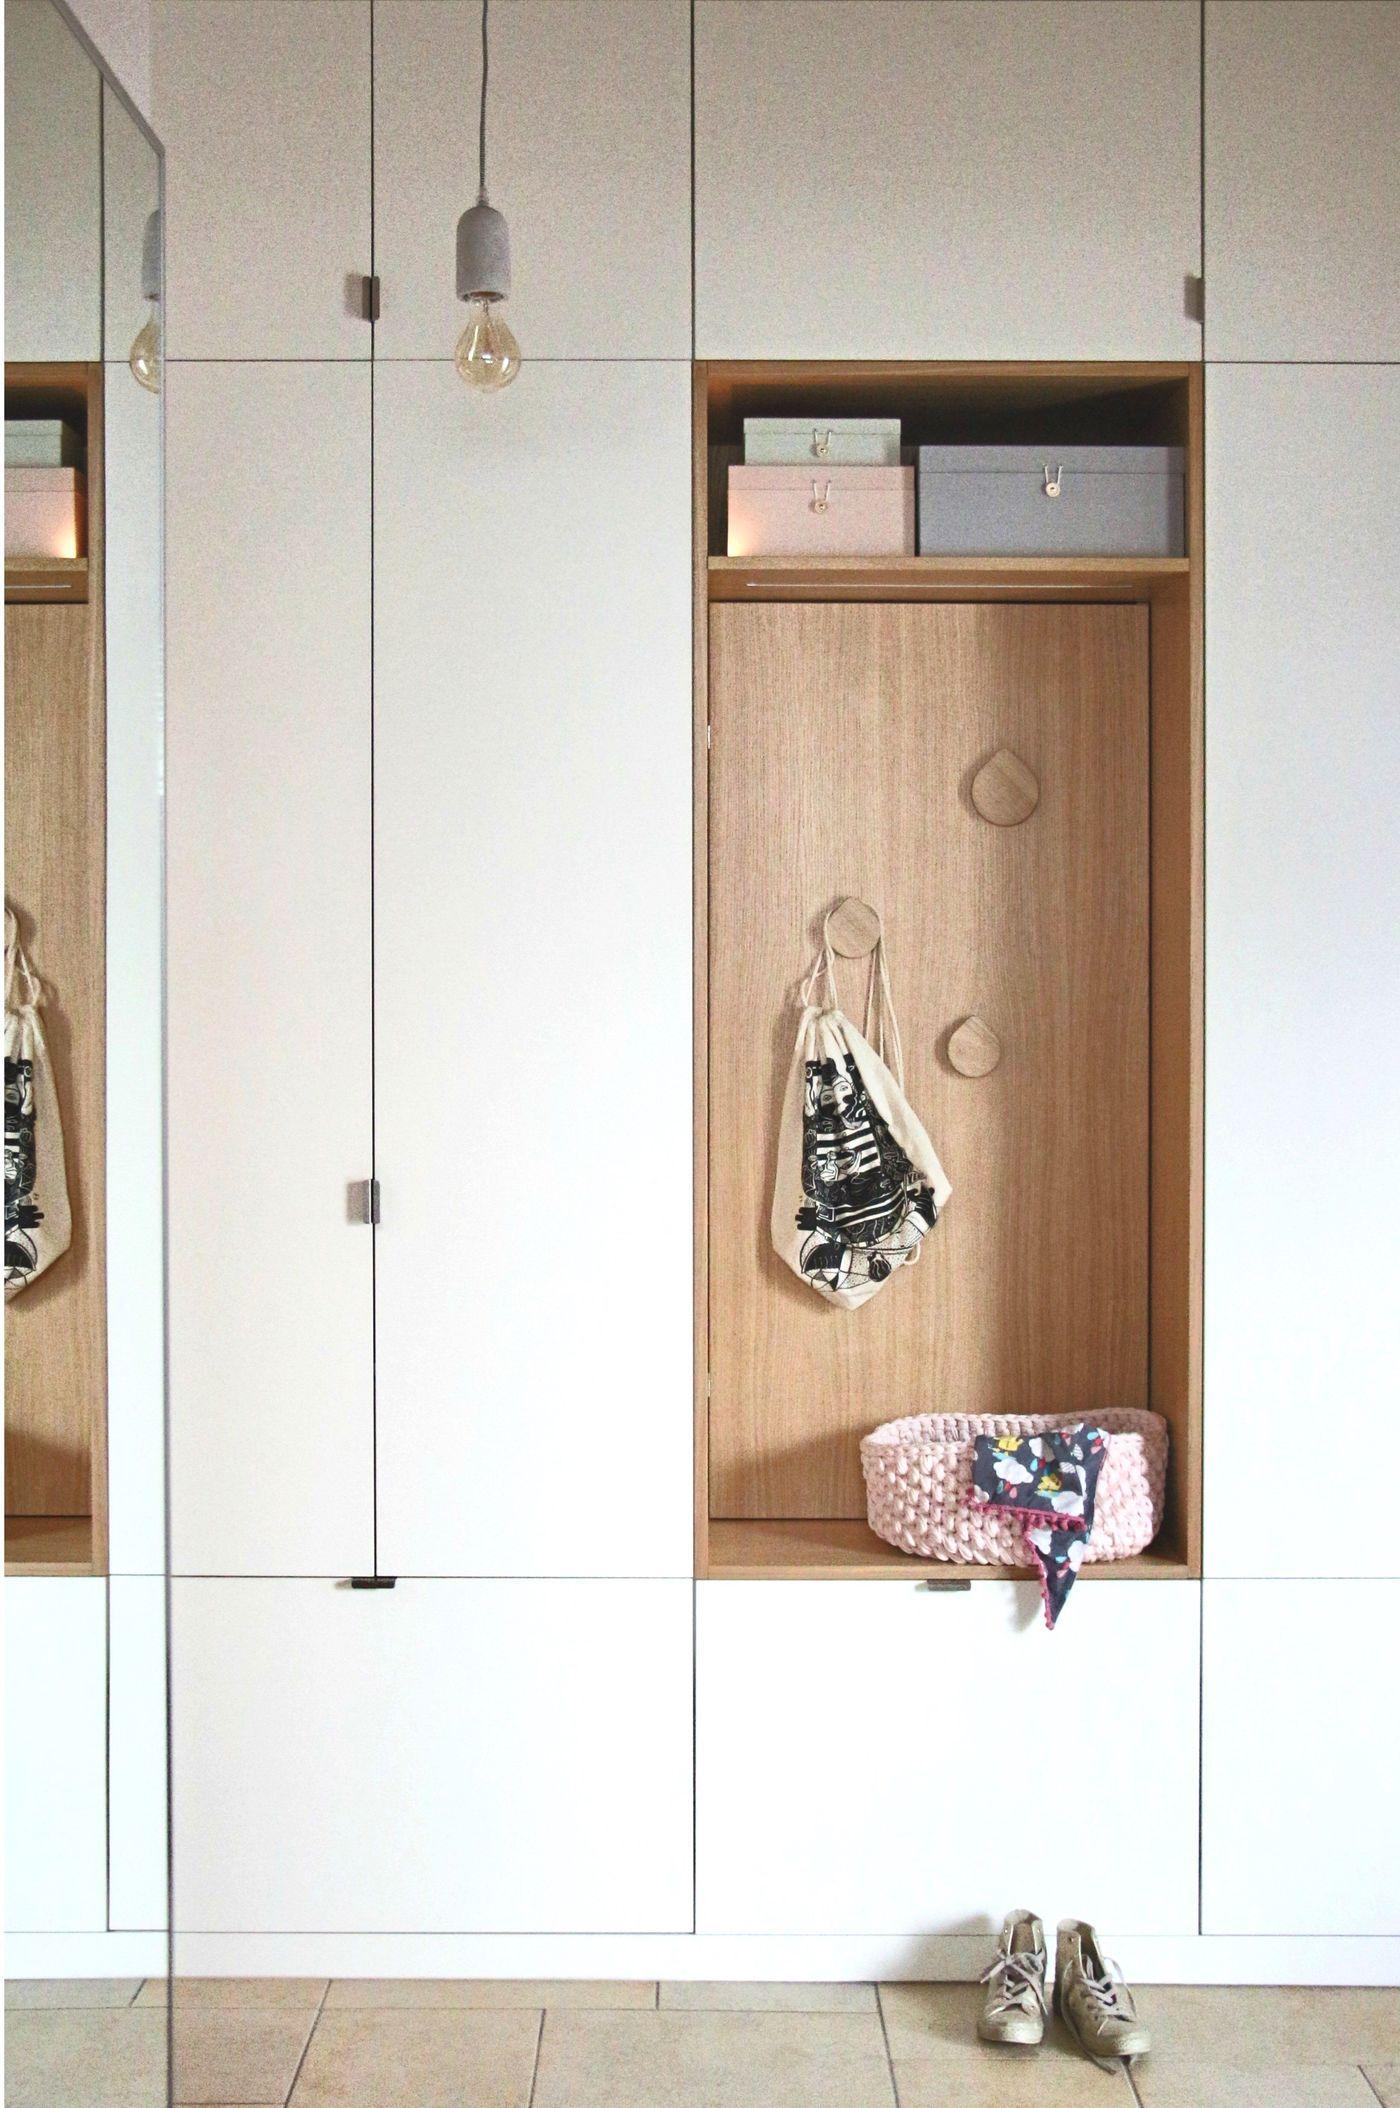 originelle garderobe selber machen full size of haus. Black Bedroom Furniture Sets. Home Design Ideas